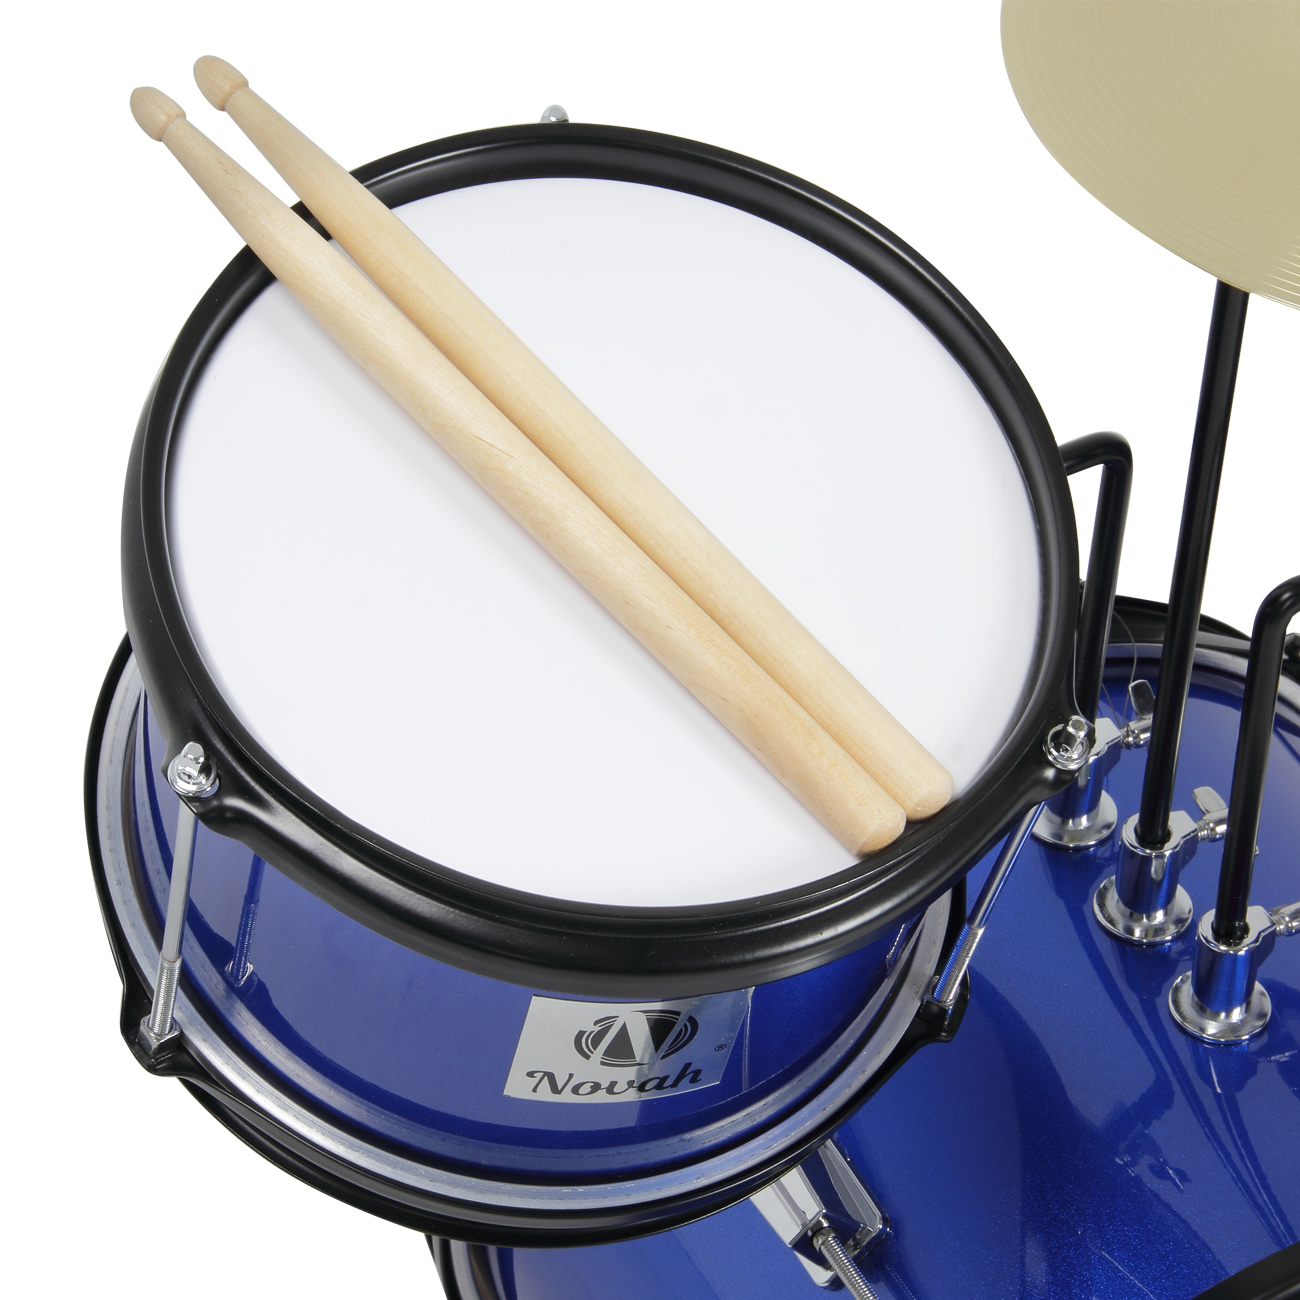 drum set 3 piece junior complete child kids kit with stool sticks seat blue ebay. Black Bedroom Furniture Sets. Home Design Ideas